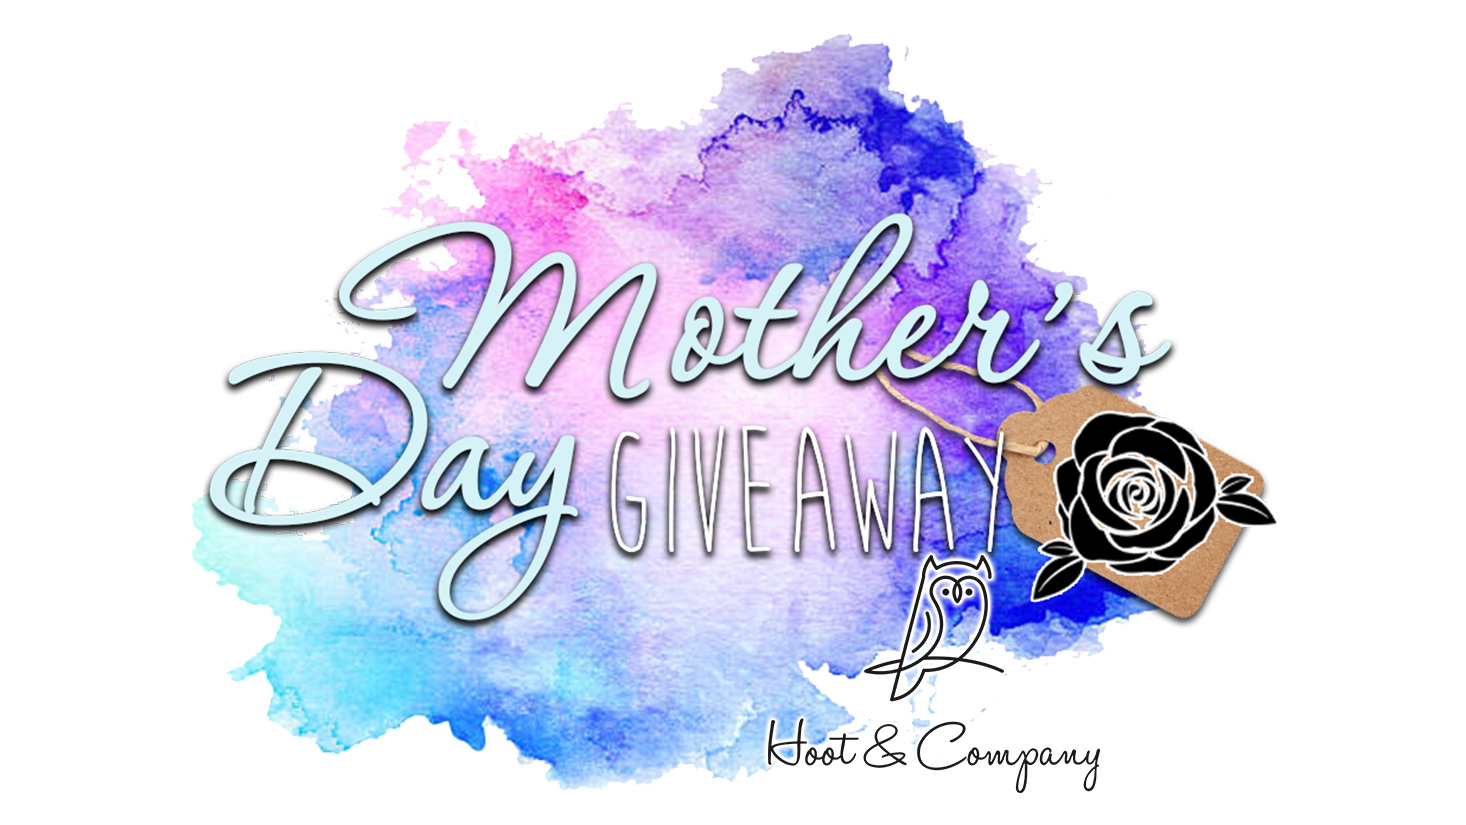 MothersDayHootCoDontMiss_1556053226343.jpg